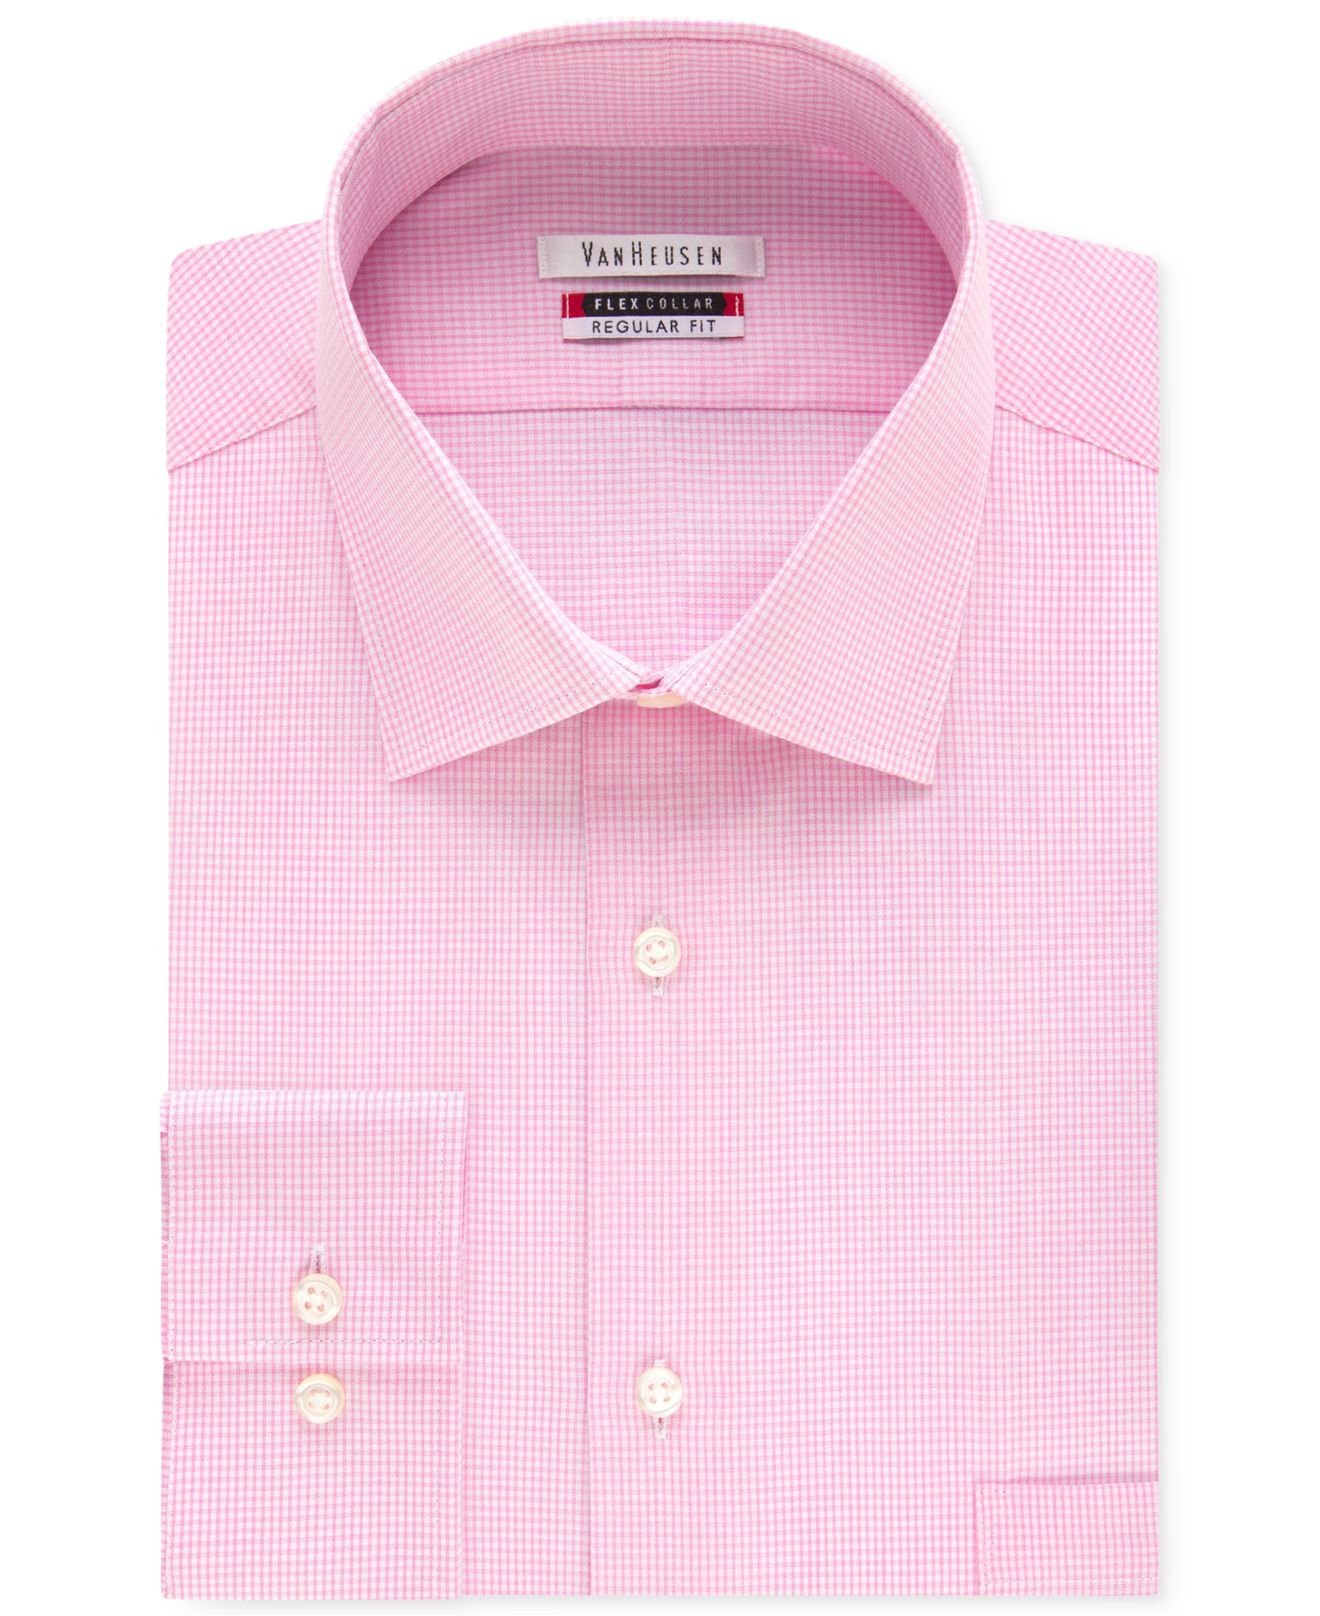 d5d269c057 Lyst - Van Heusen Men s Tek Fit Flex Collar Bright Pink Gingham ...